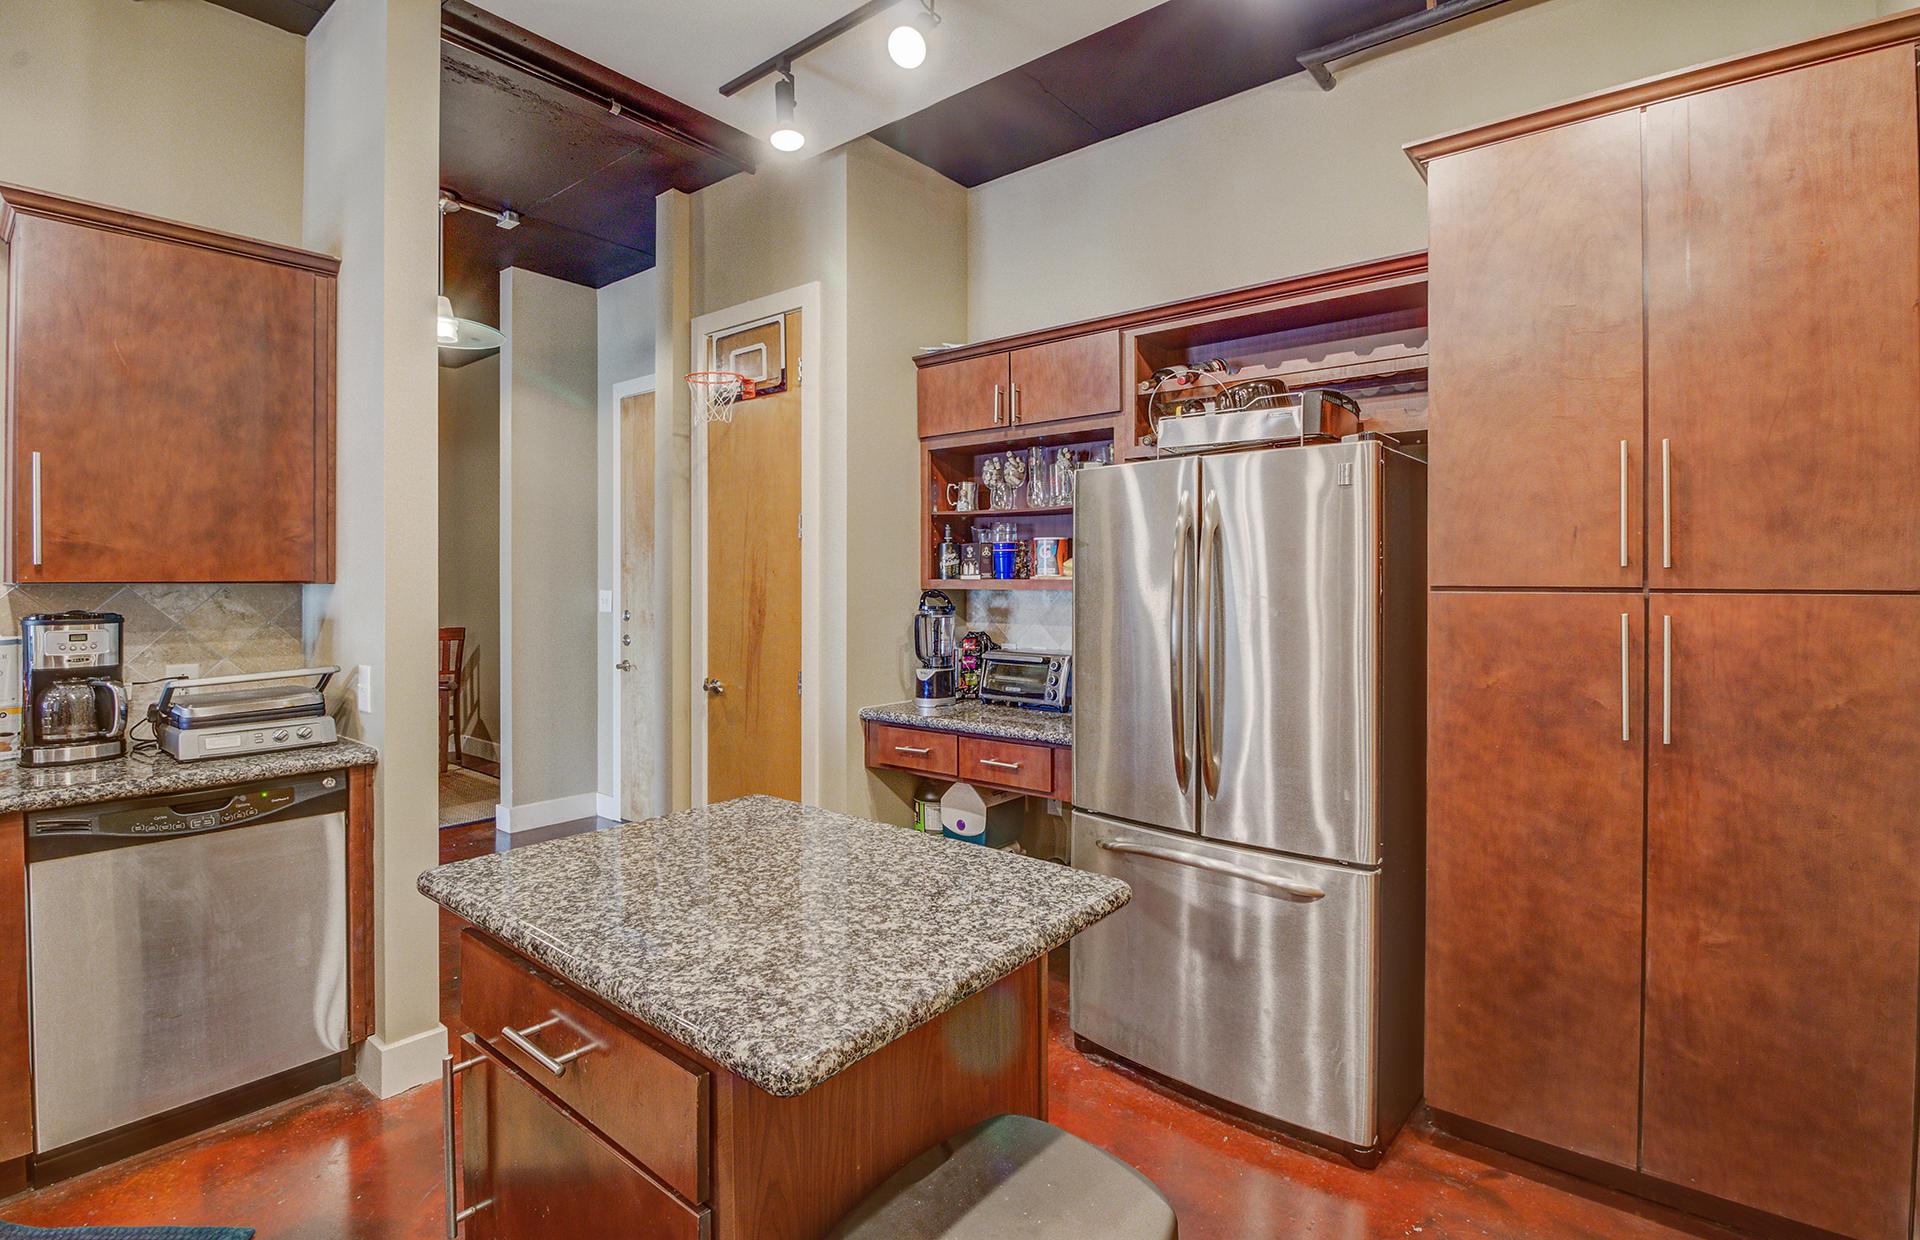 Bee Street Lofts Homes For Sale - 150 Bee, Charleston, SC - 10